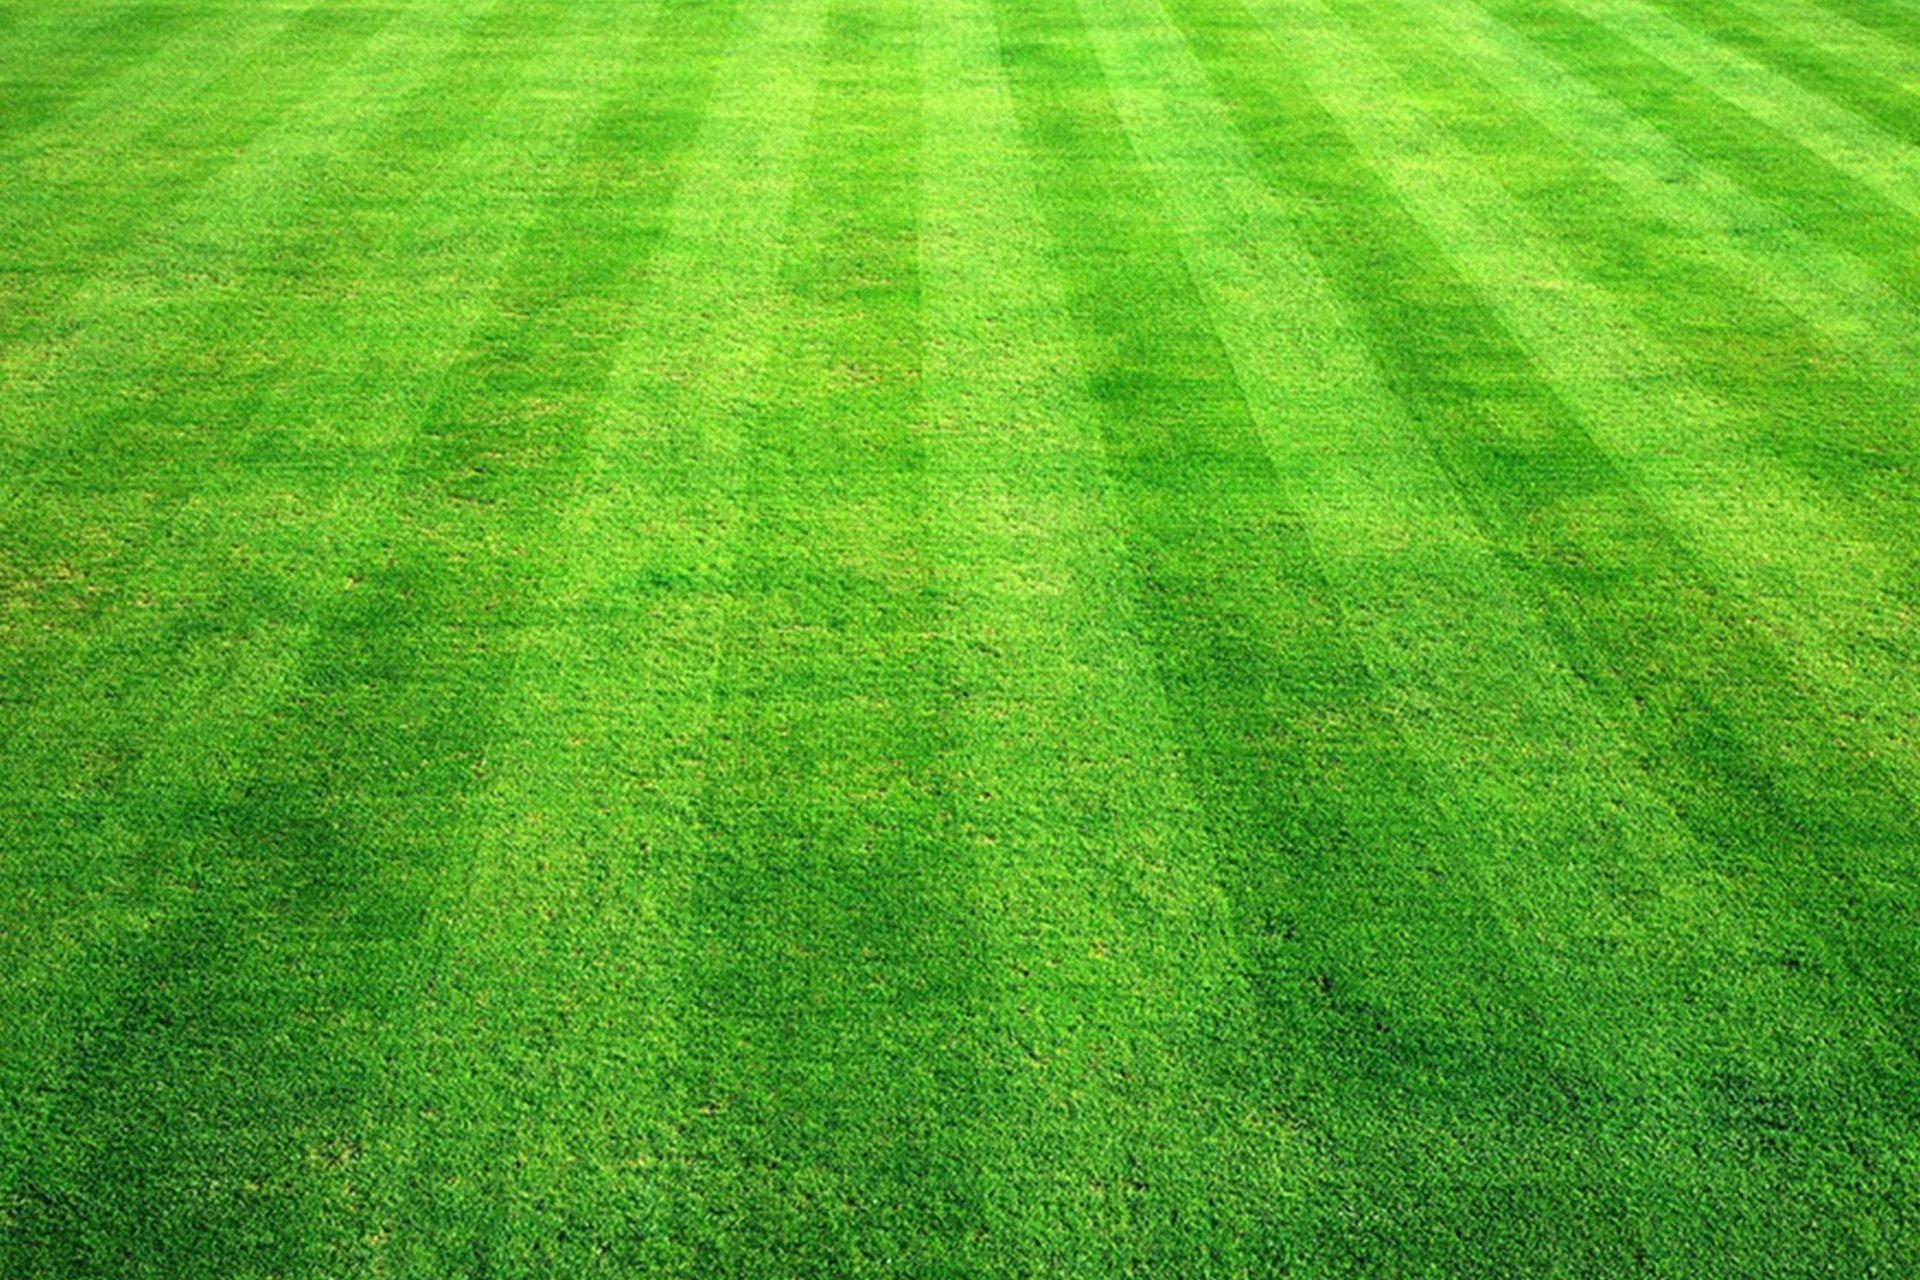 Stouts Lawn Care